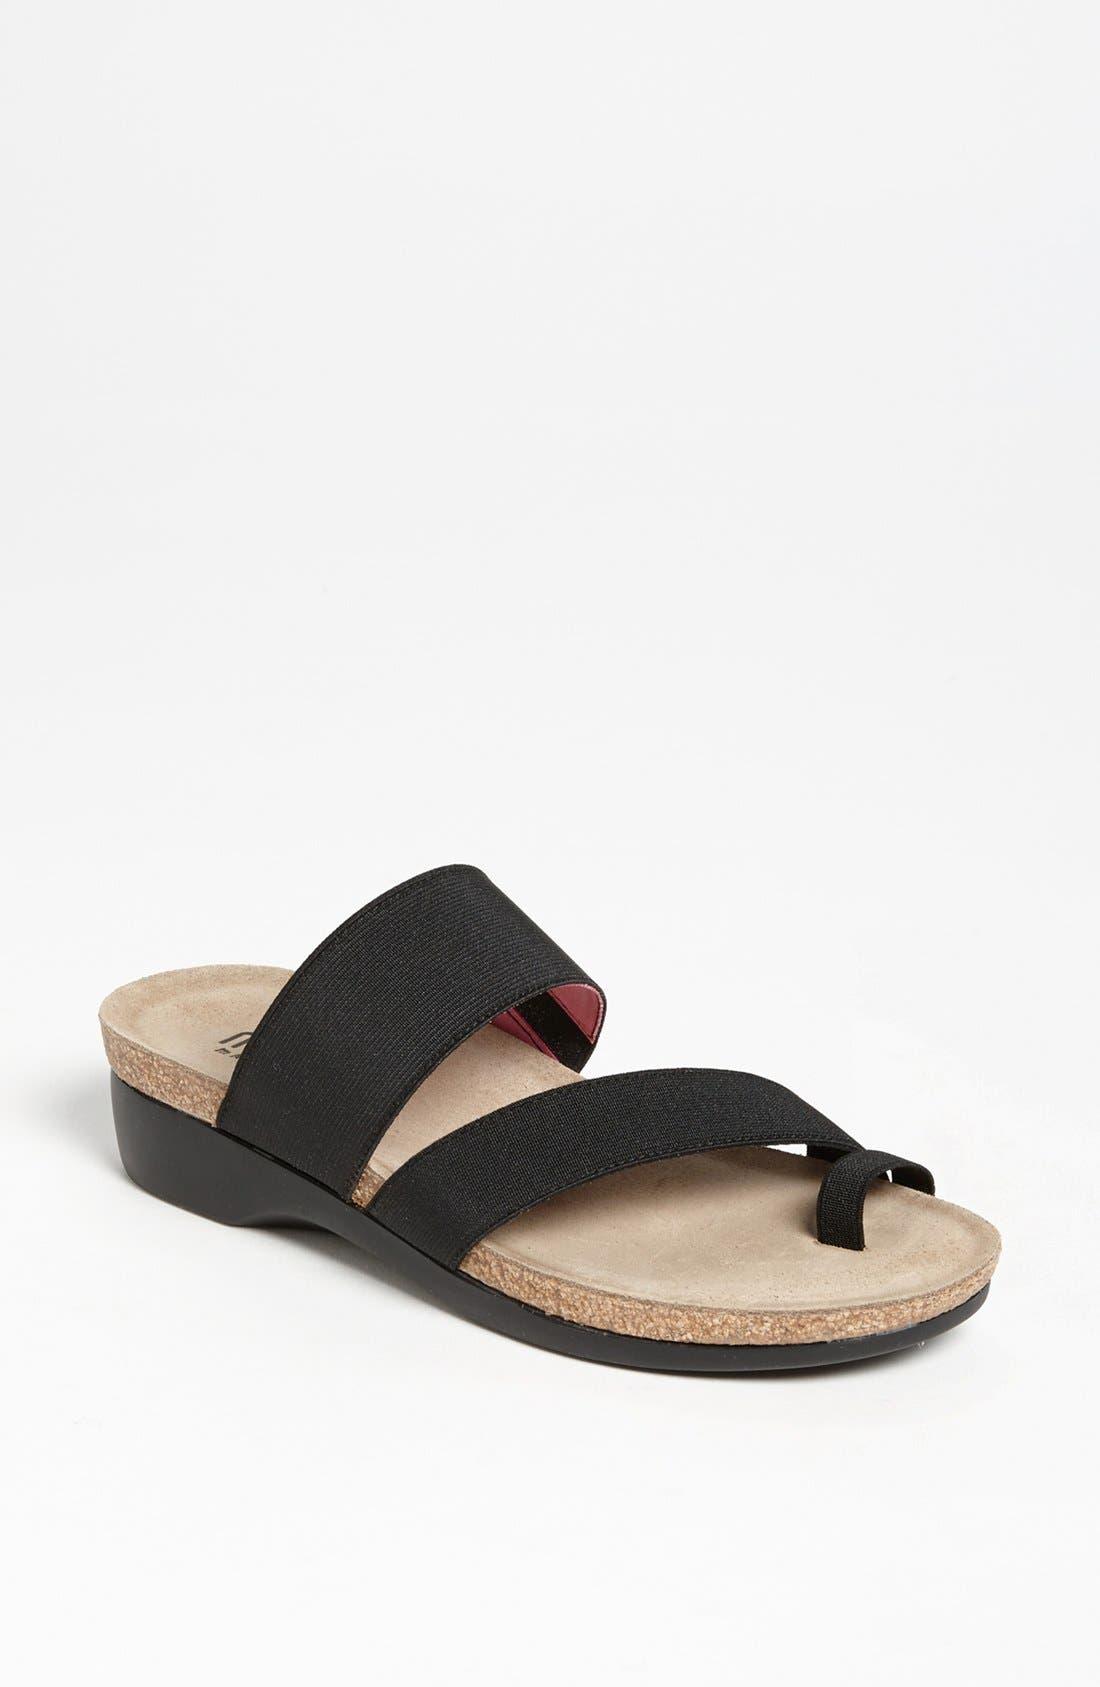 Munro 'Aries' Sandal